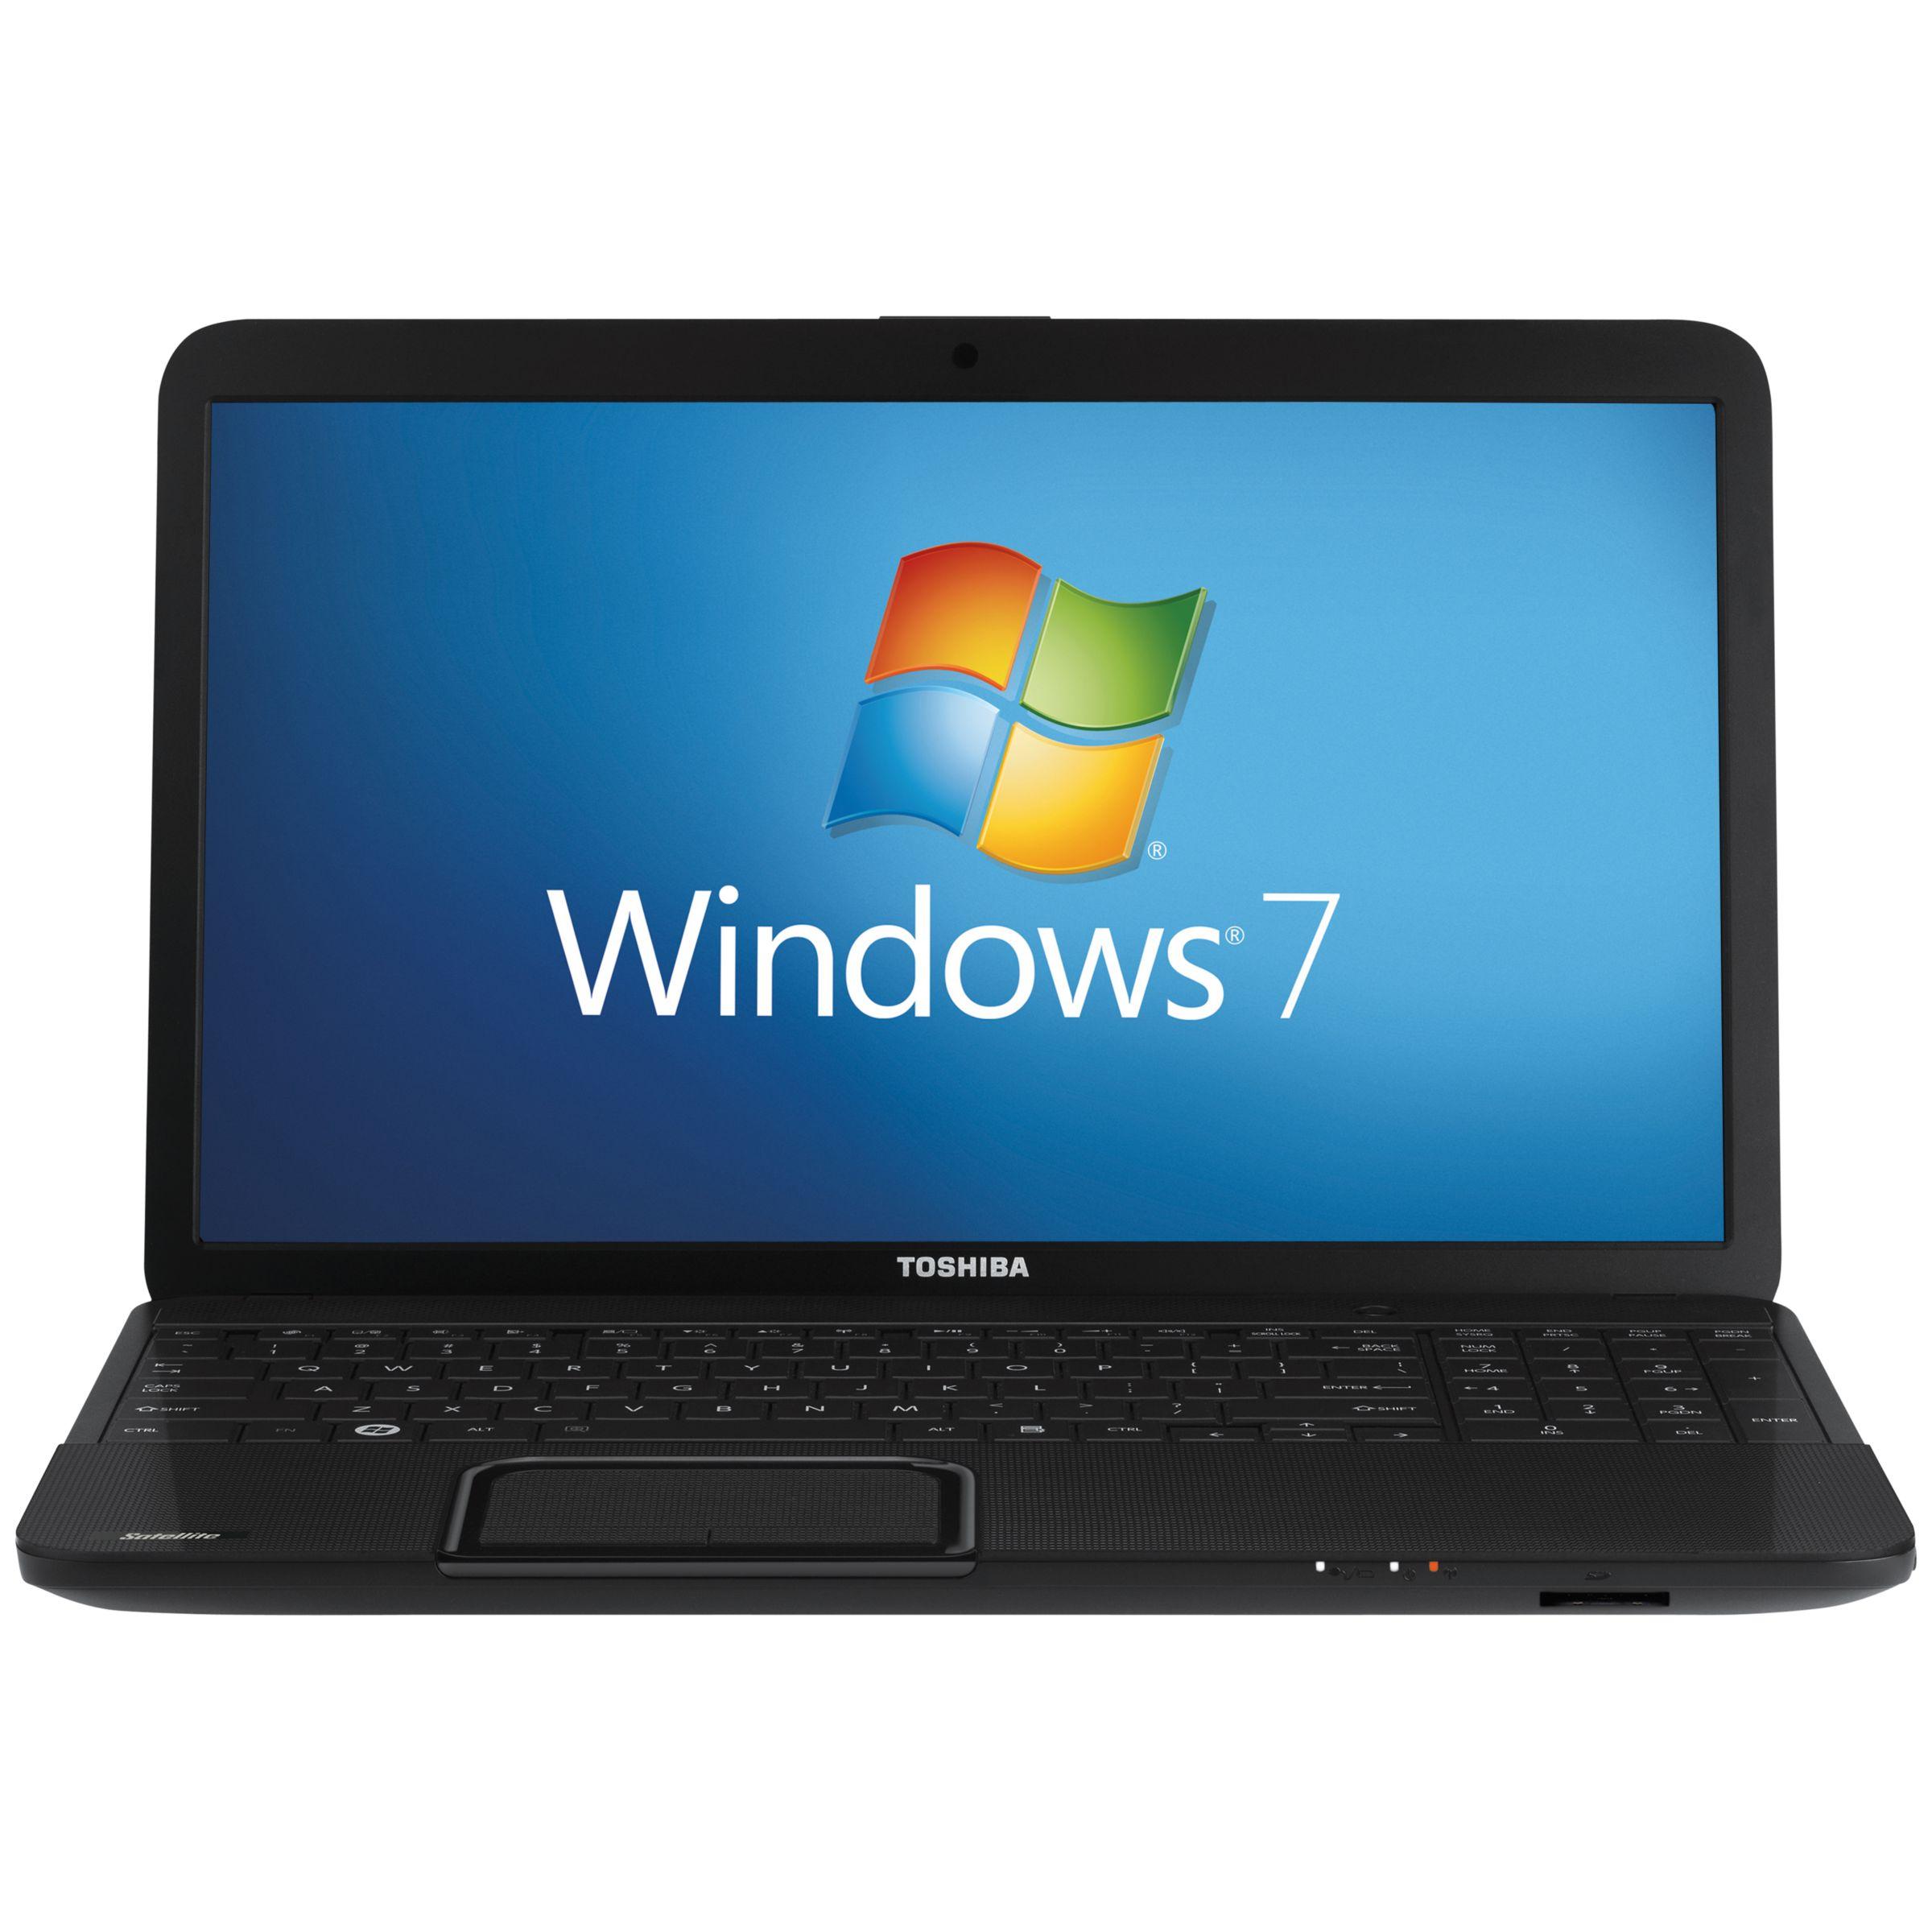 "Toshiba Satellite C850-161 Laptop, Intel Core I3, 2.1ghz, 4gb Ram, 500gb, 15.6"", Black"